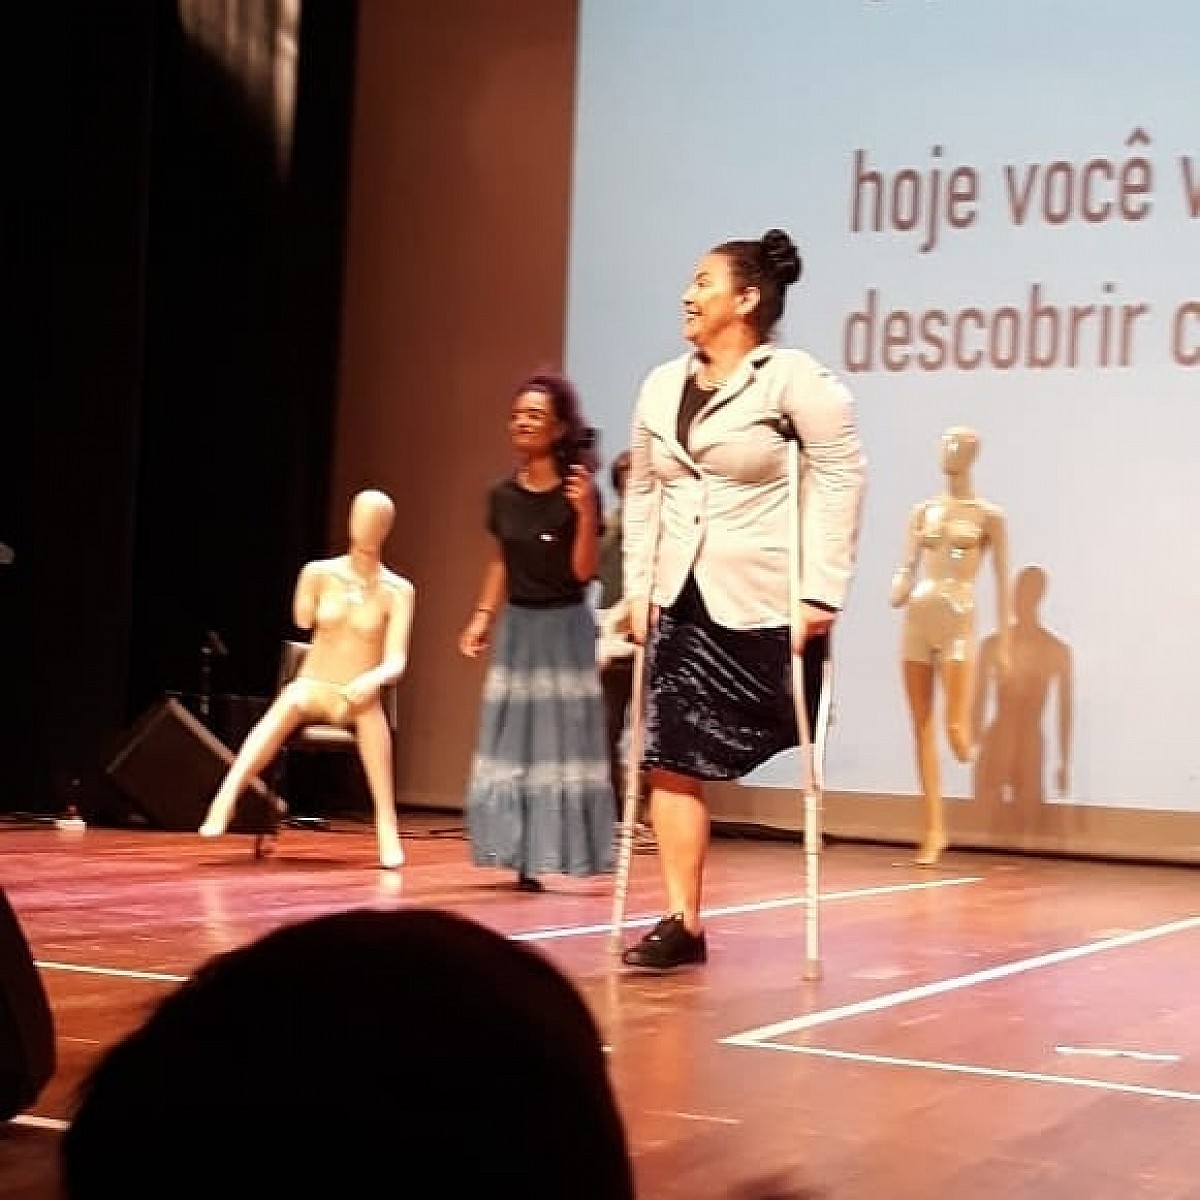 Avareenses participam de Desfile de Moda Inclusiva em Bauru